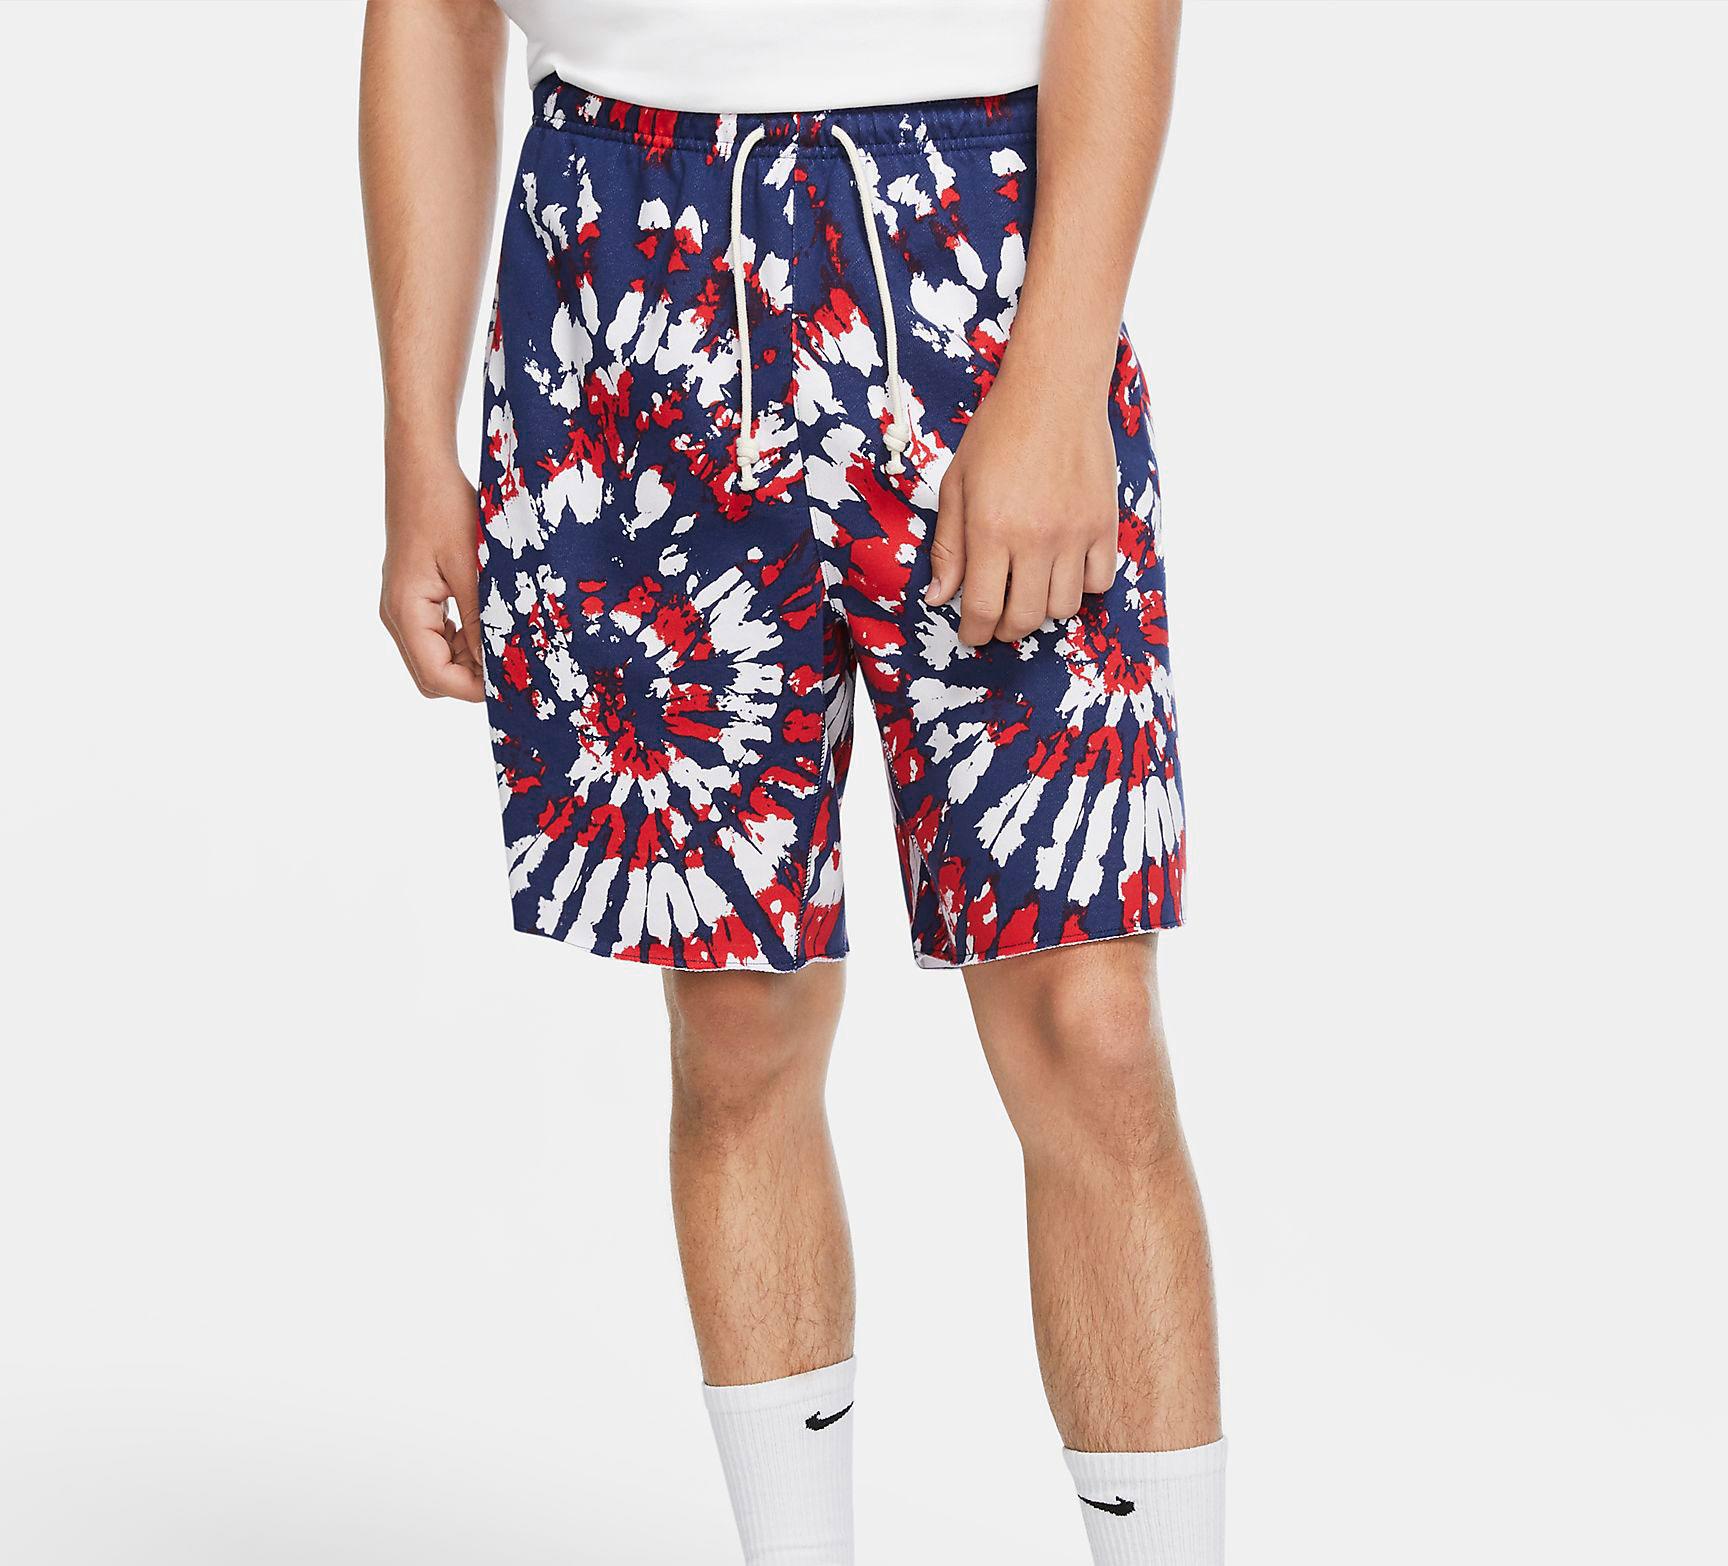 nike-lebron-17-graffiti-fire-red-cold-blue-shorts-1